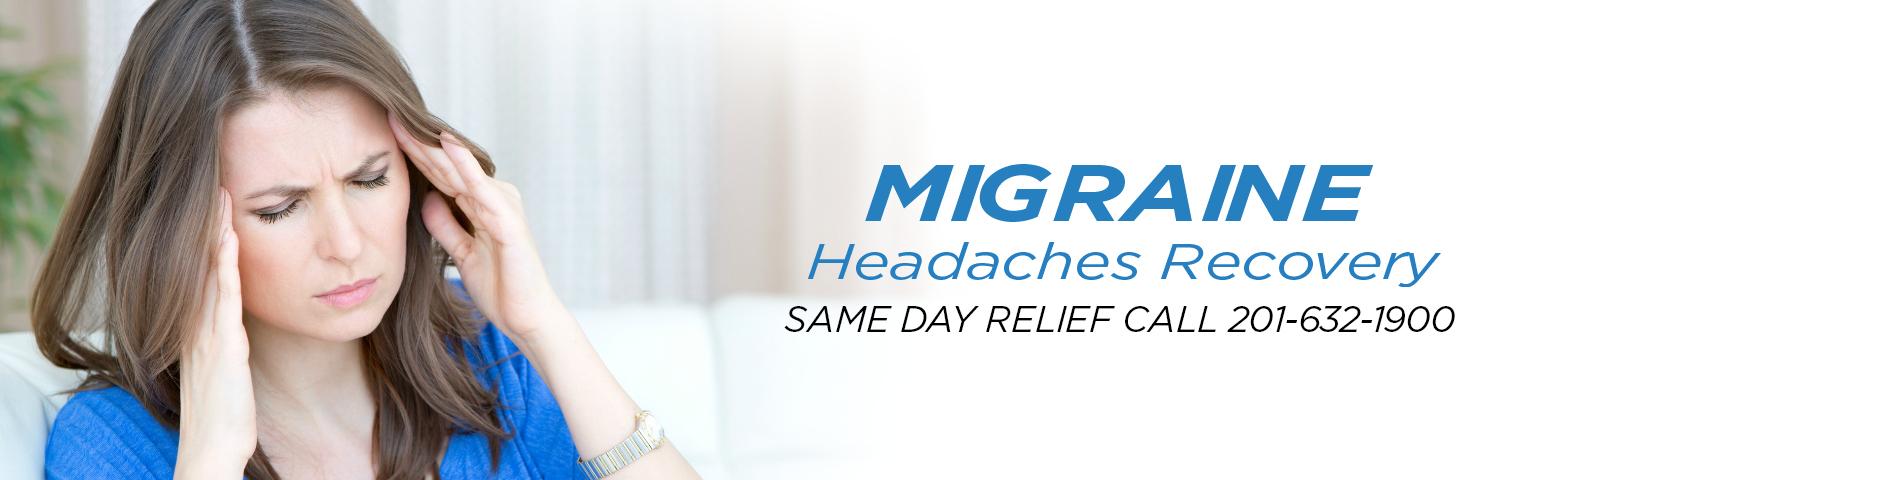 Migraine Headaches Recovery